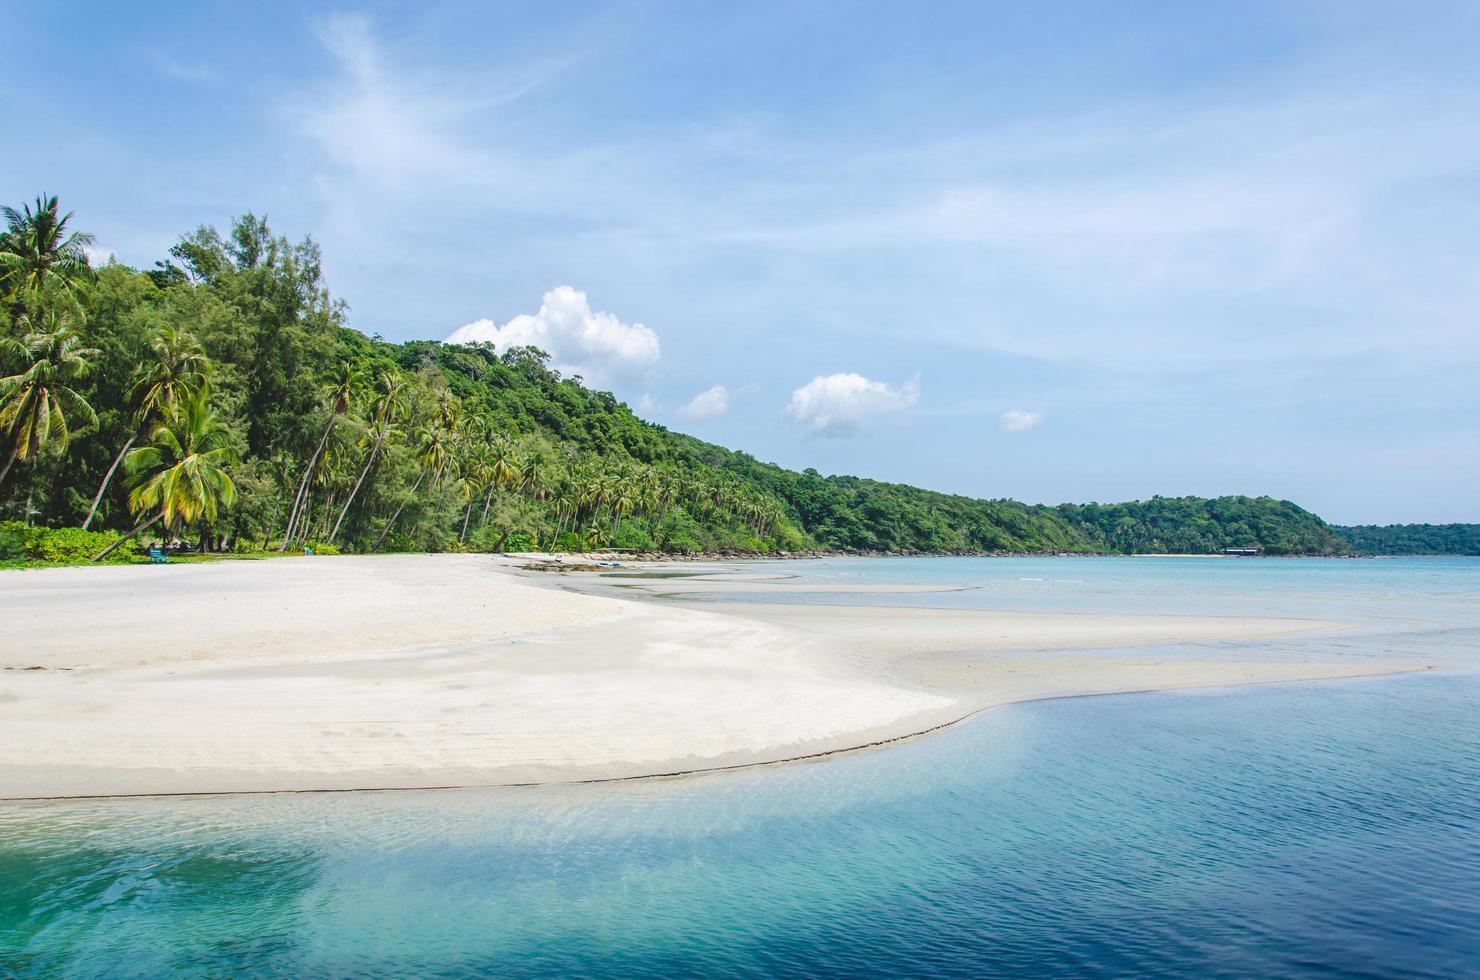 leeg tropisch strand foto